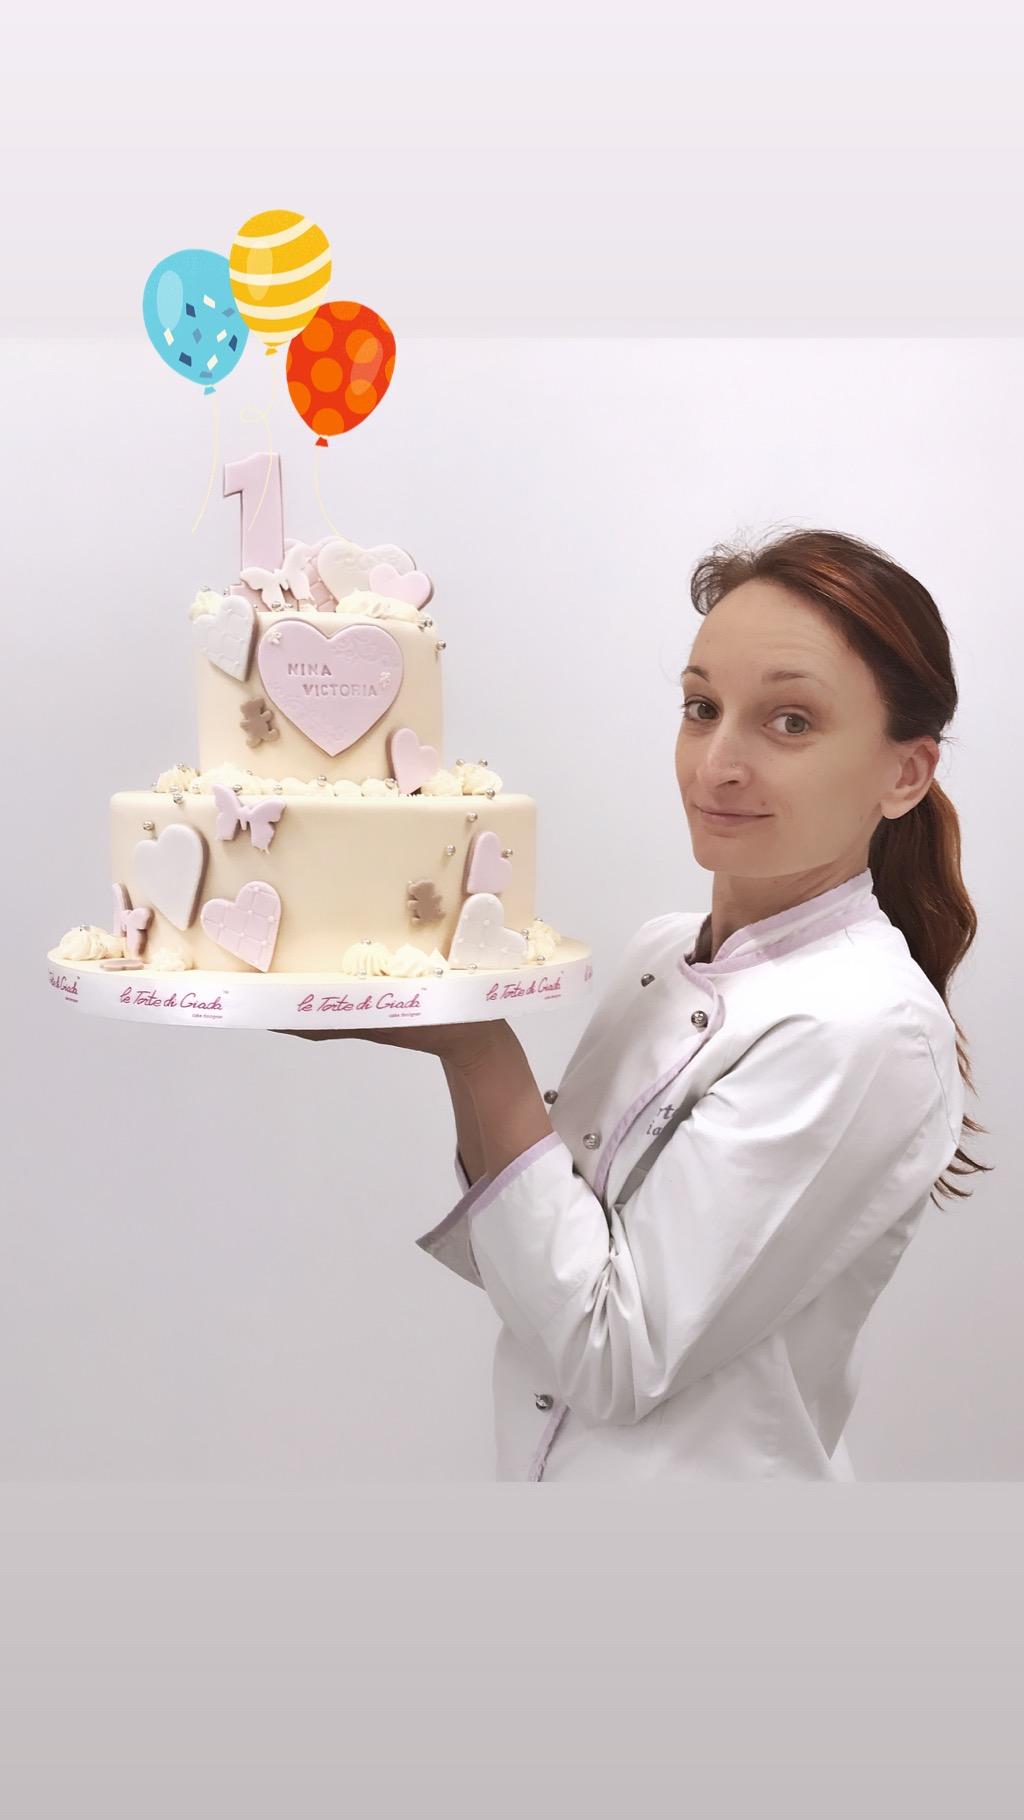 giada farina cake designer brescia